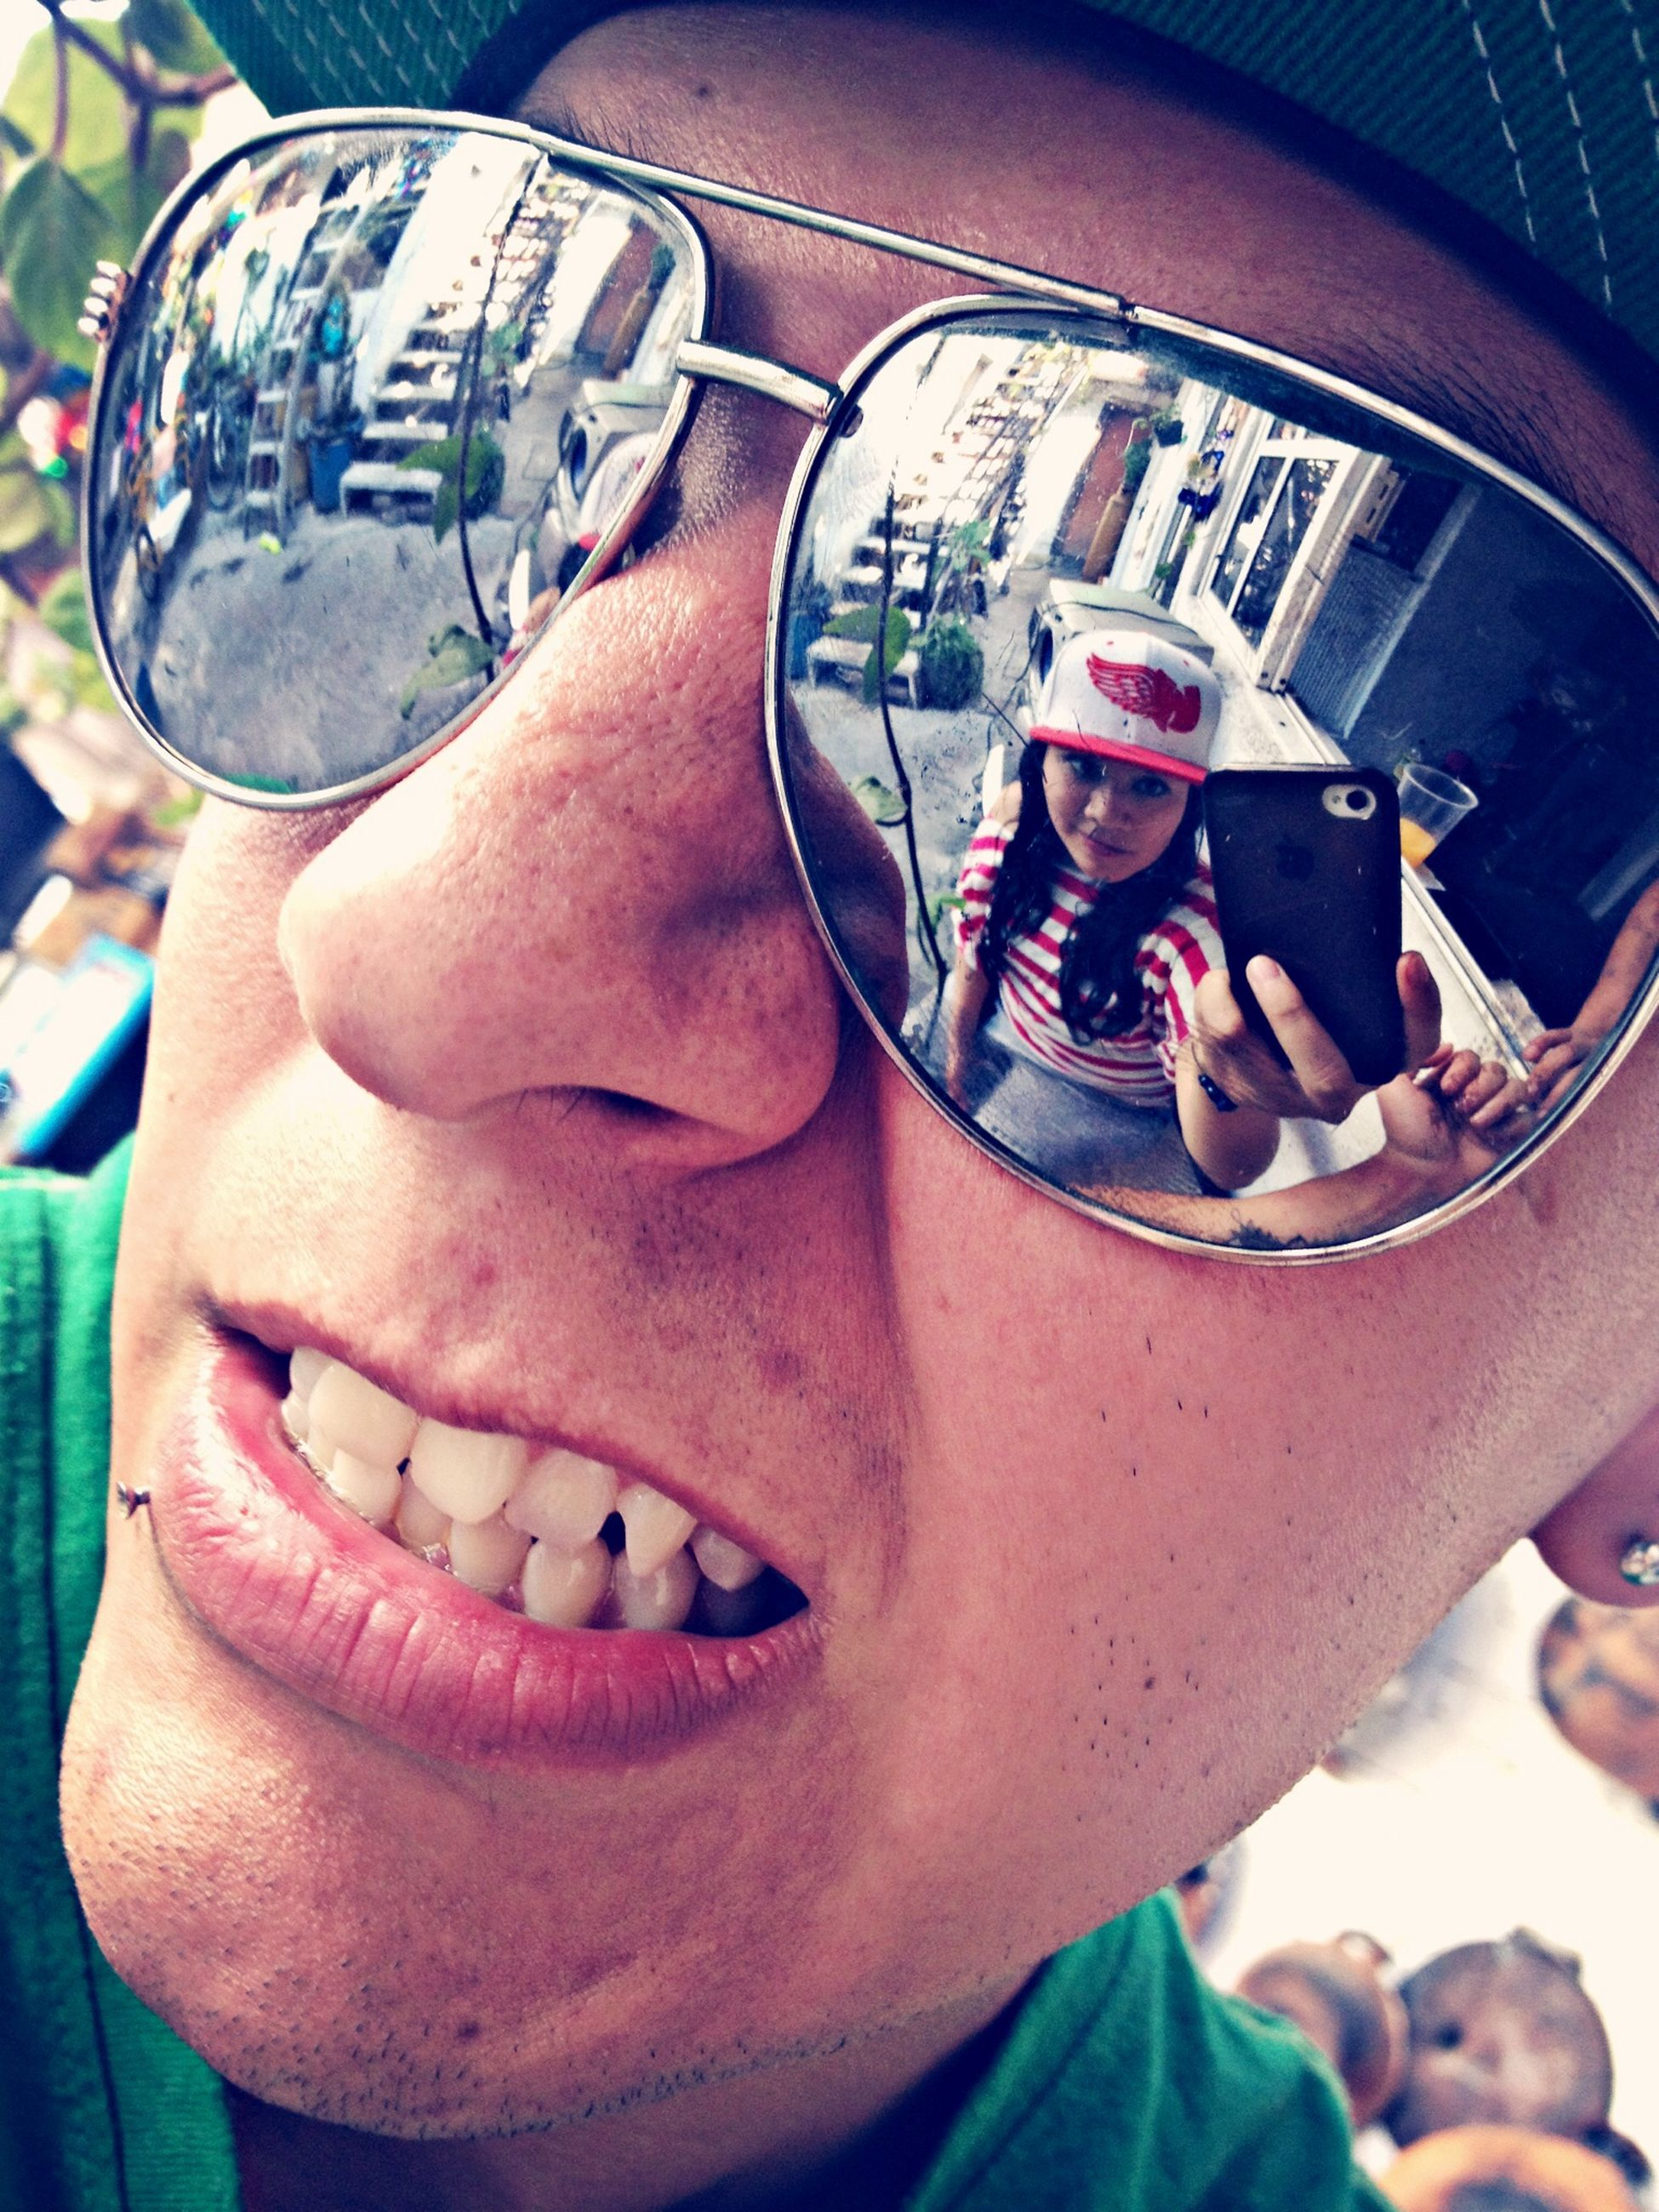 lifestyles, leisure activity, transportation, mode of transport, land vehicle, holding, men, part of, close-up, car, vehicle interior, headshot, photography themes, technology, person, travel, reflection